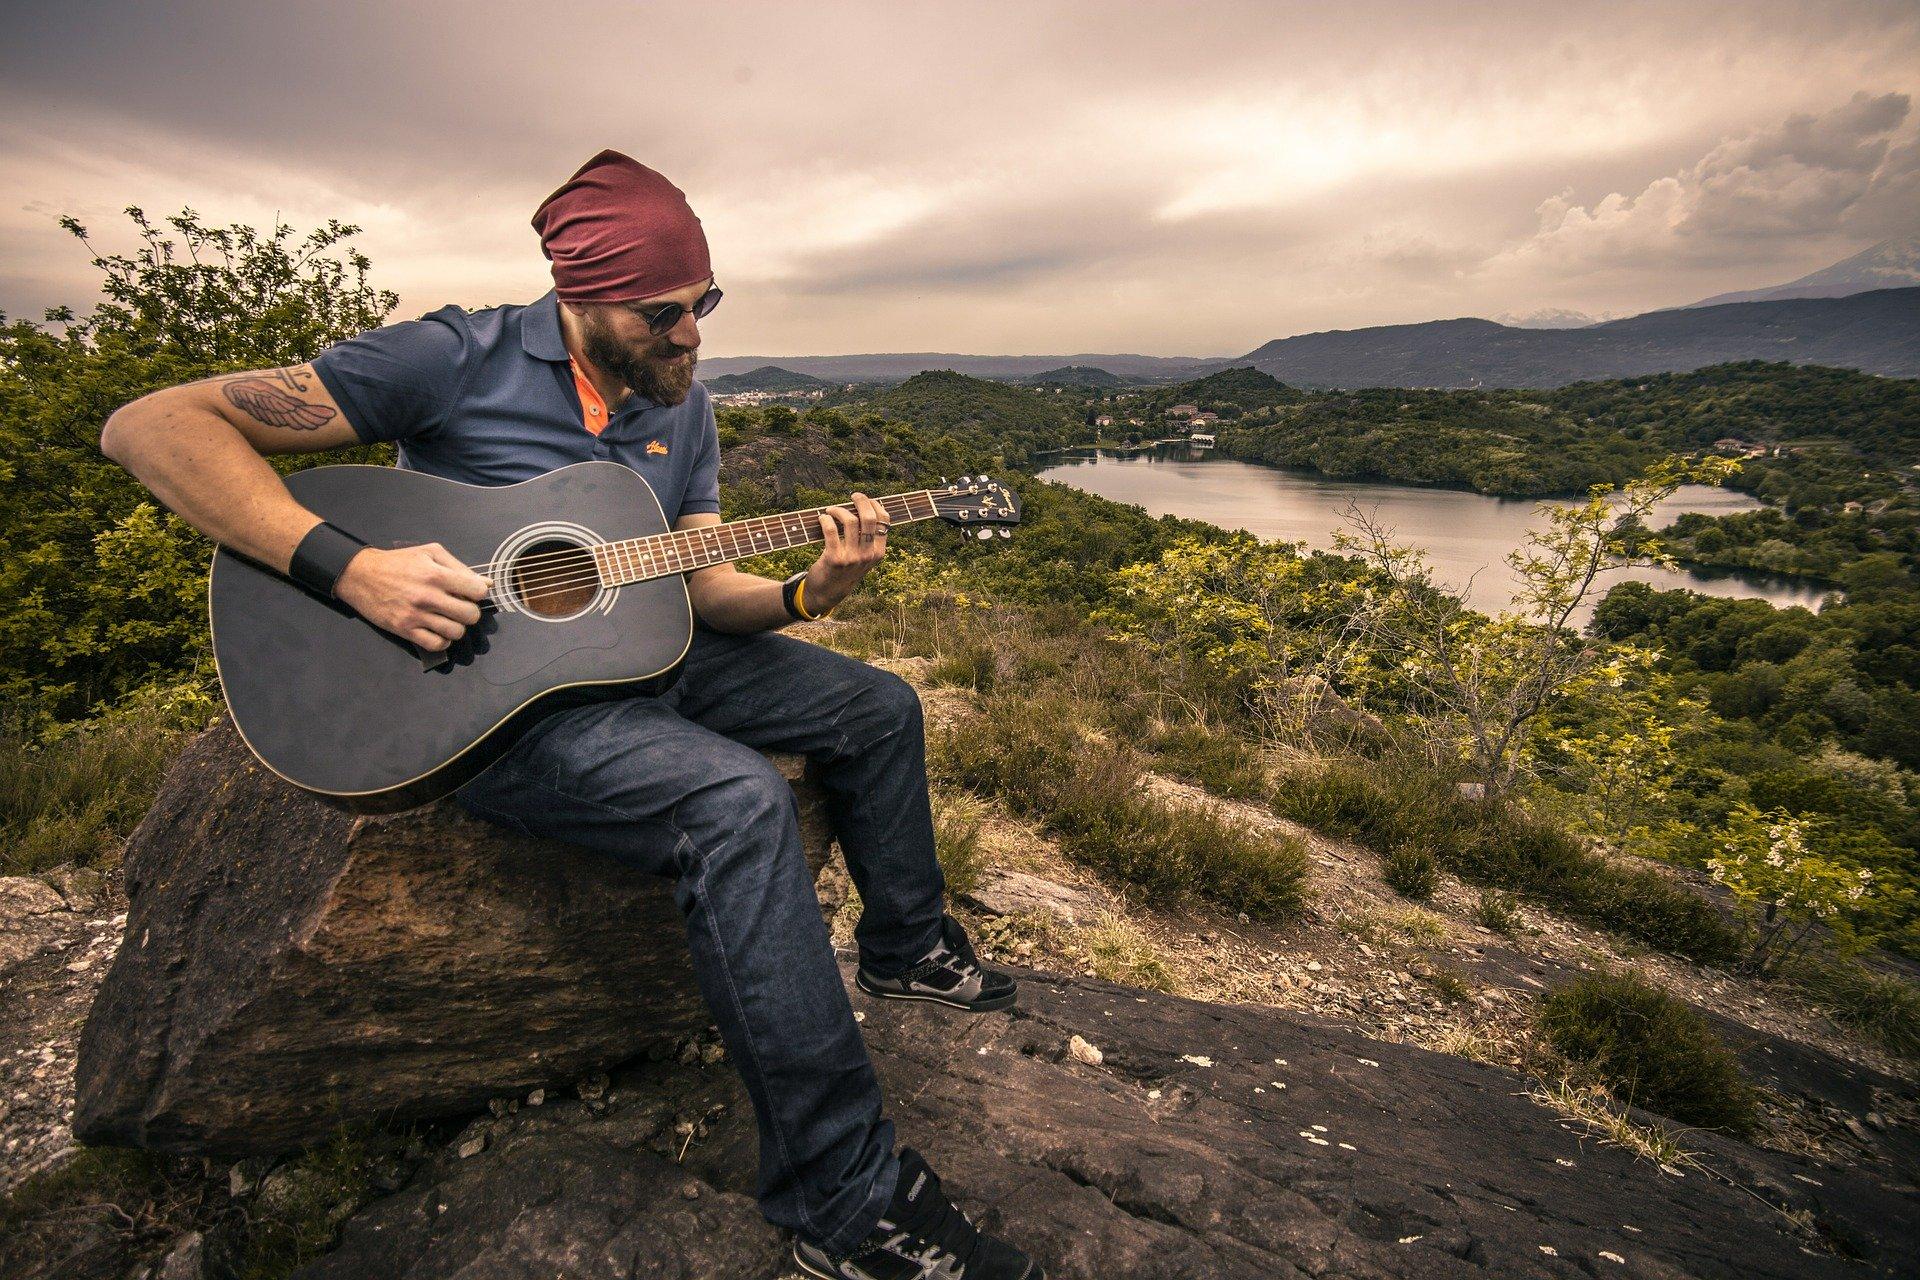 guitarist in nature